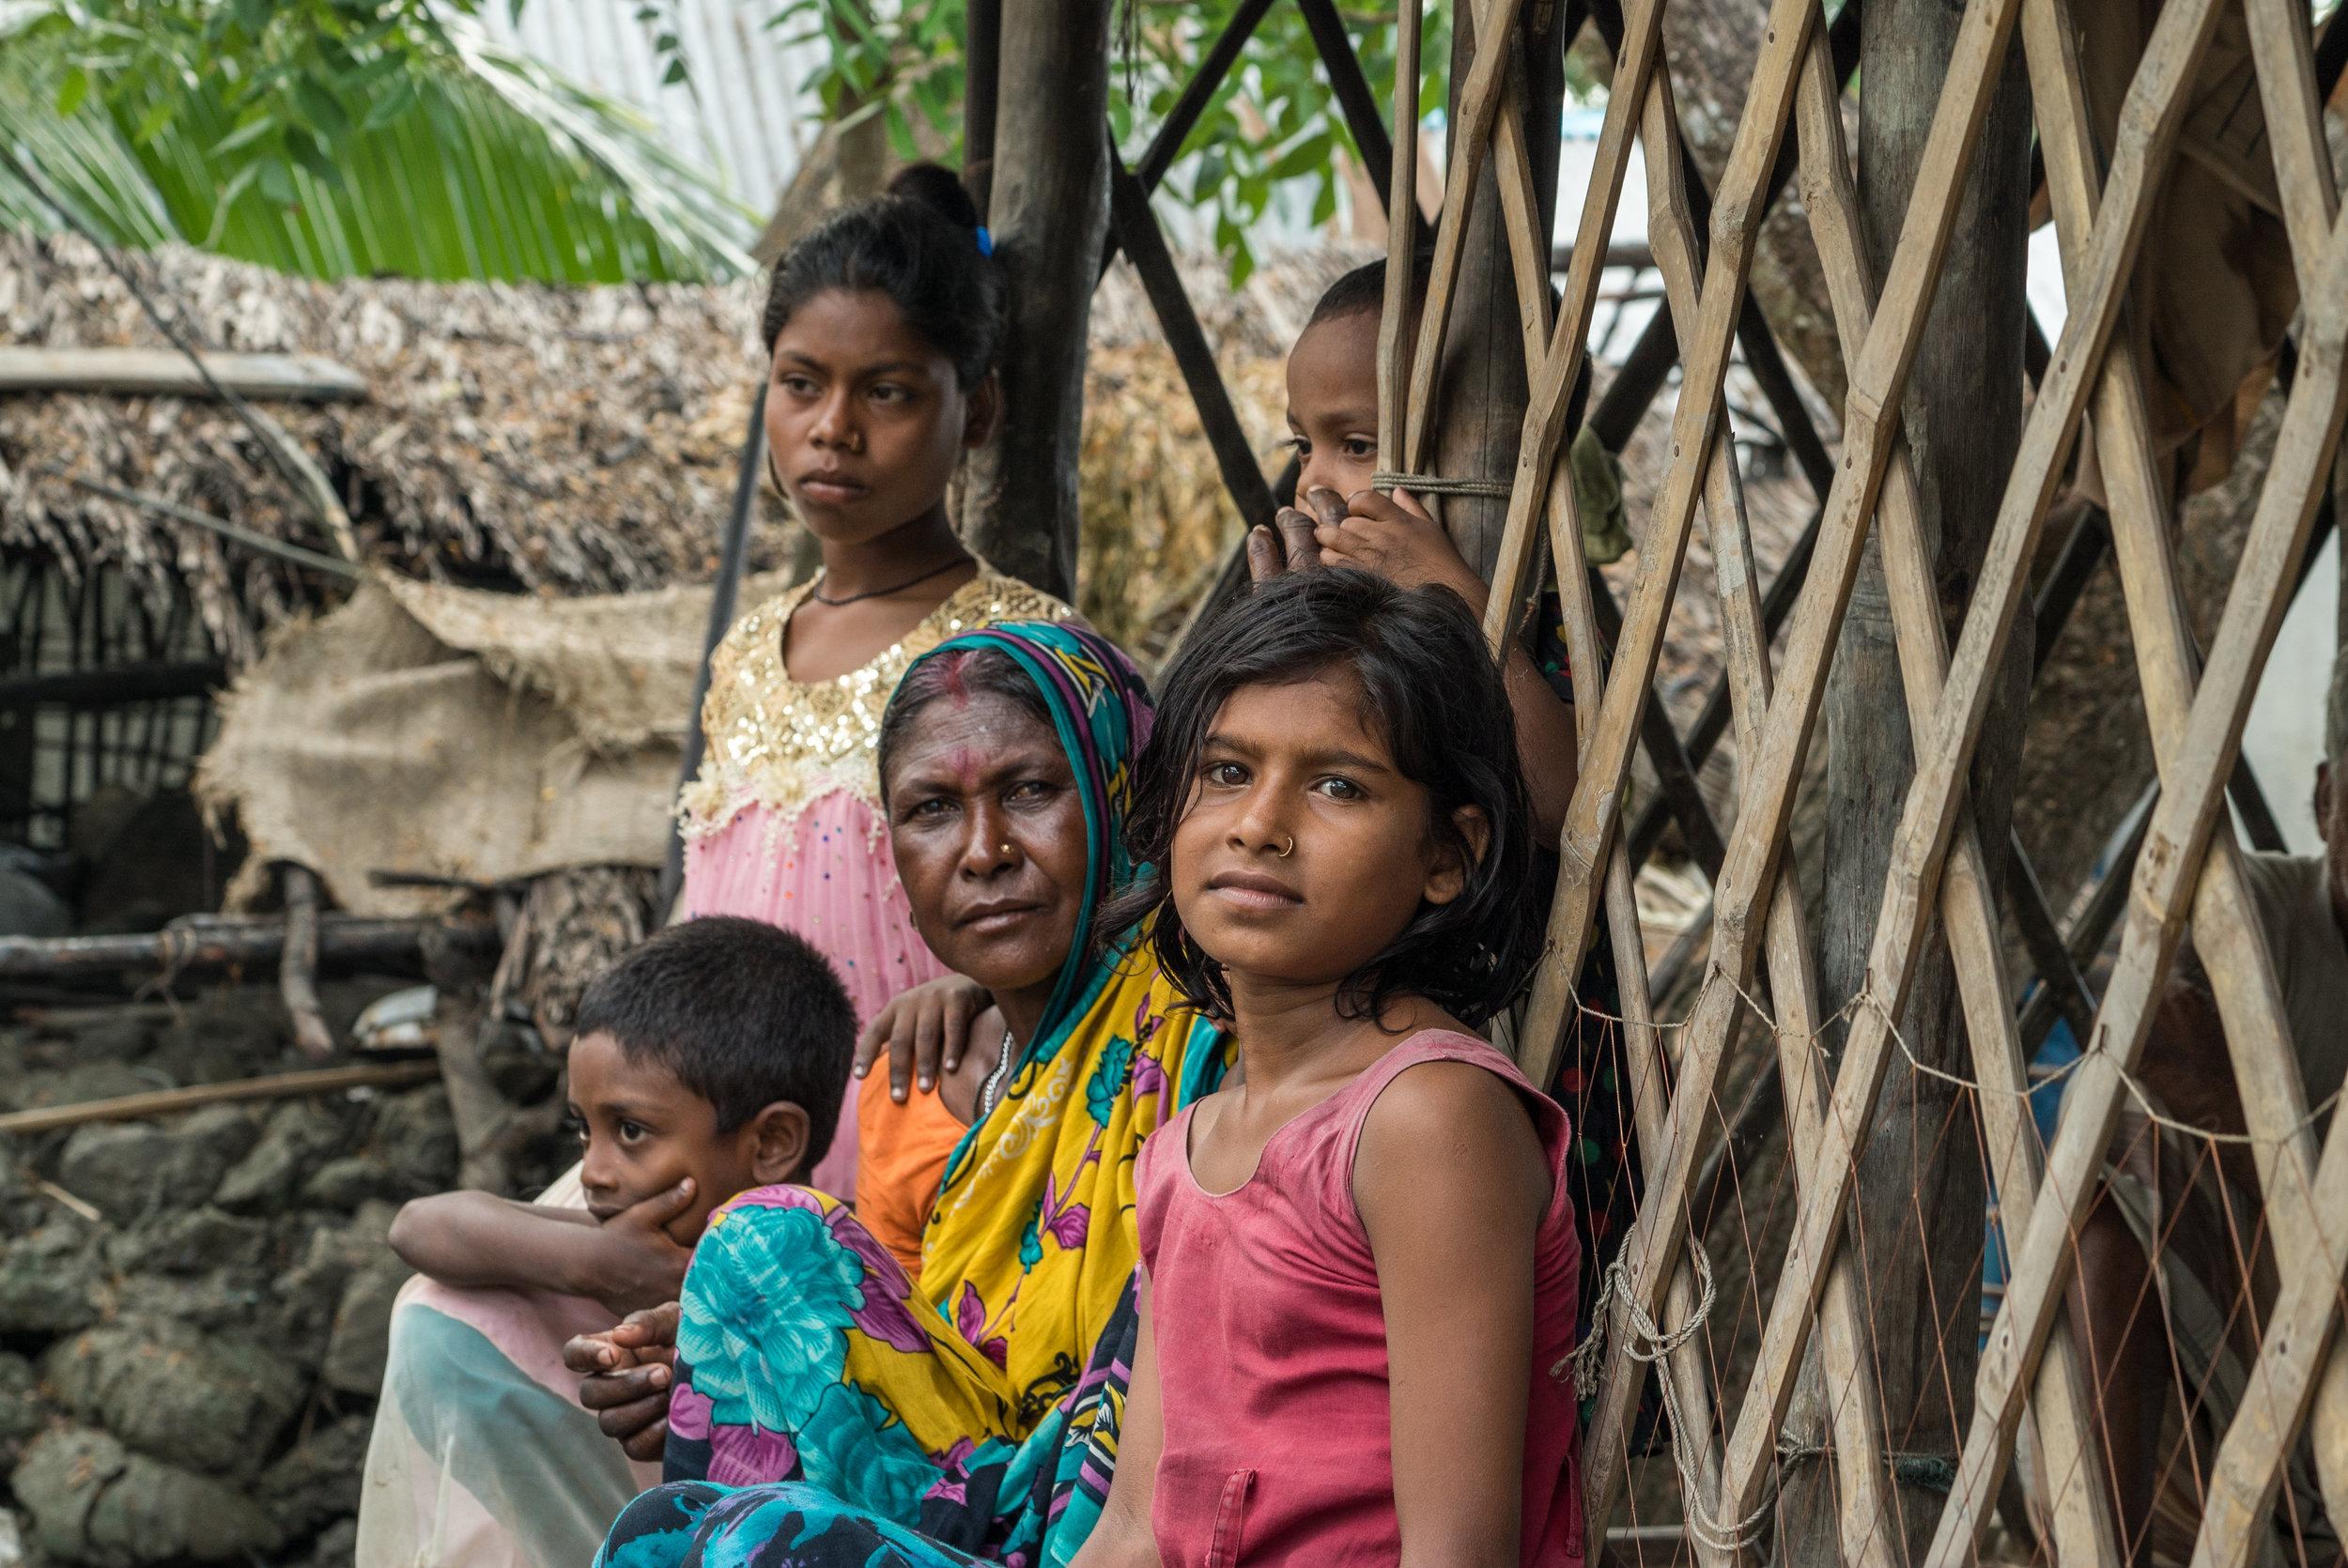 bangladesh-cyclone-shelter-mangrove-planting-sundurbans-Photo-by-Aaron-Minks-DSC05407-Edit.jpg